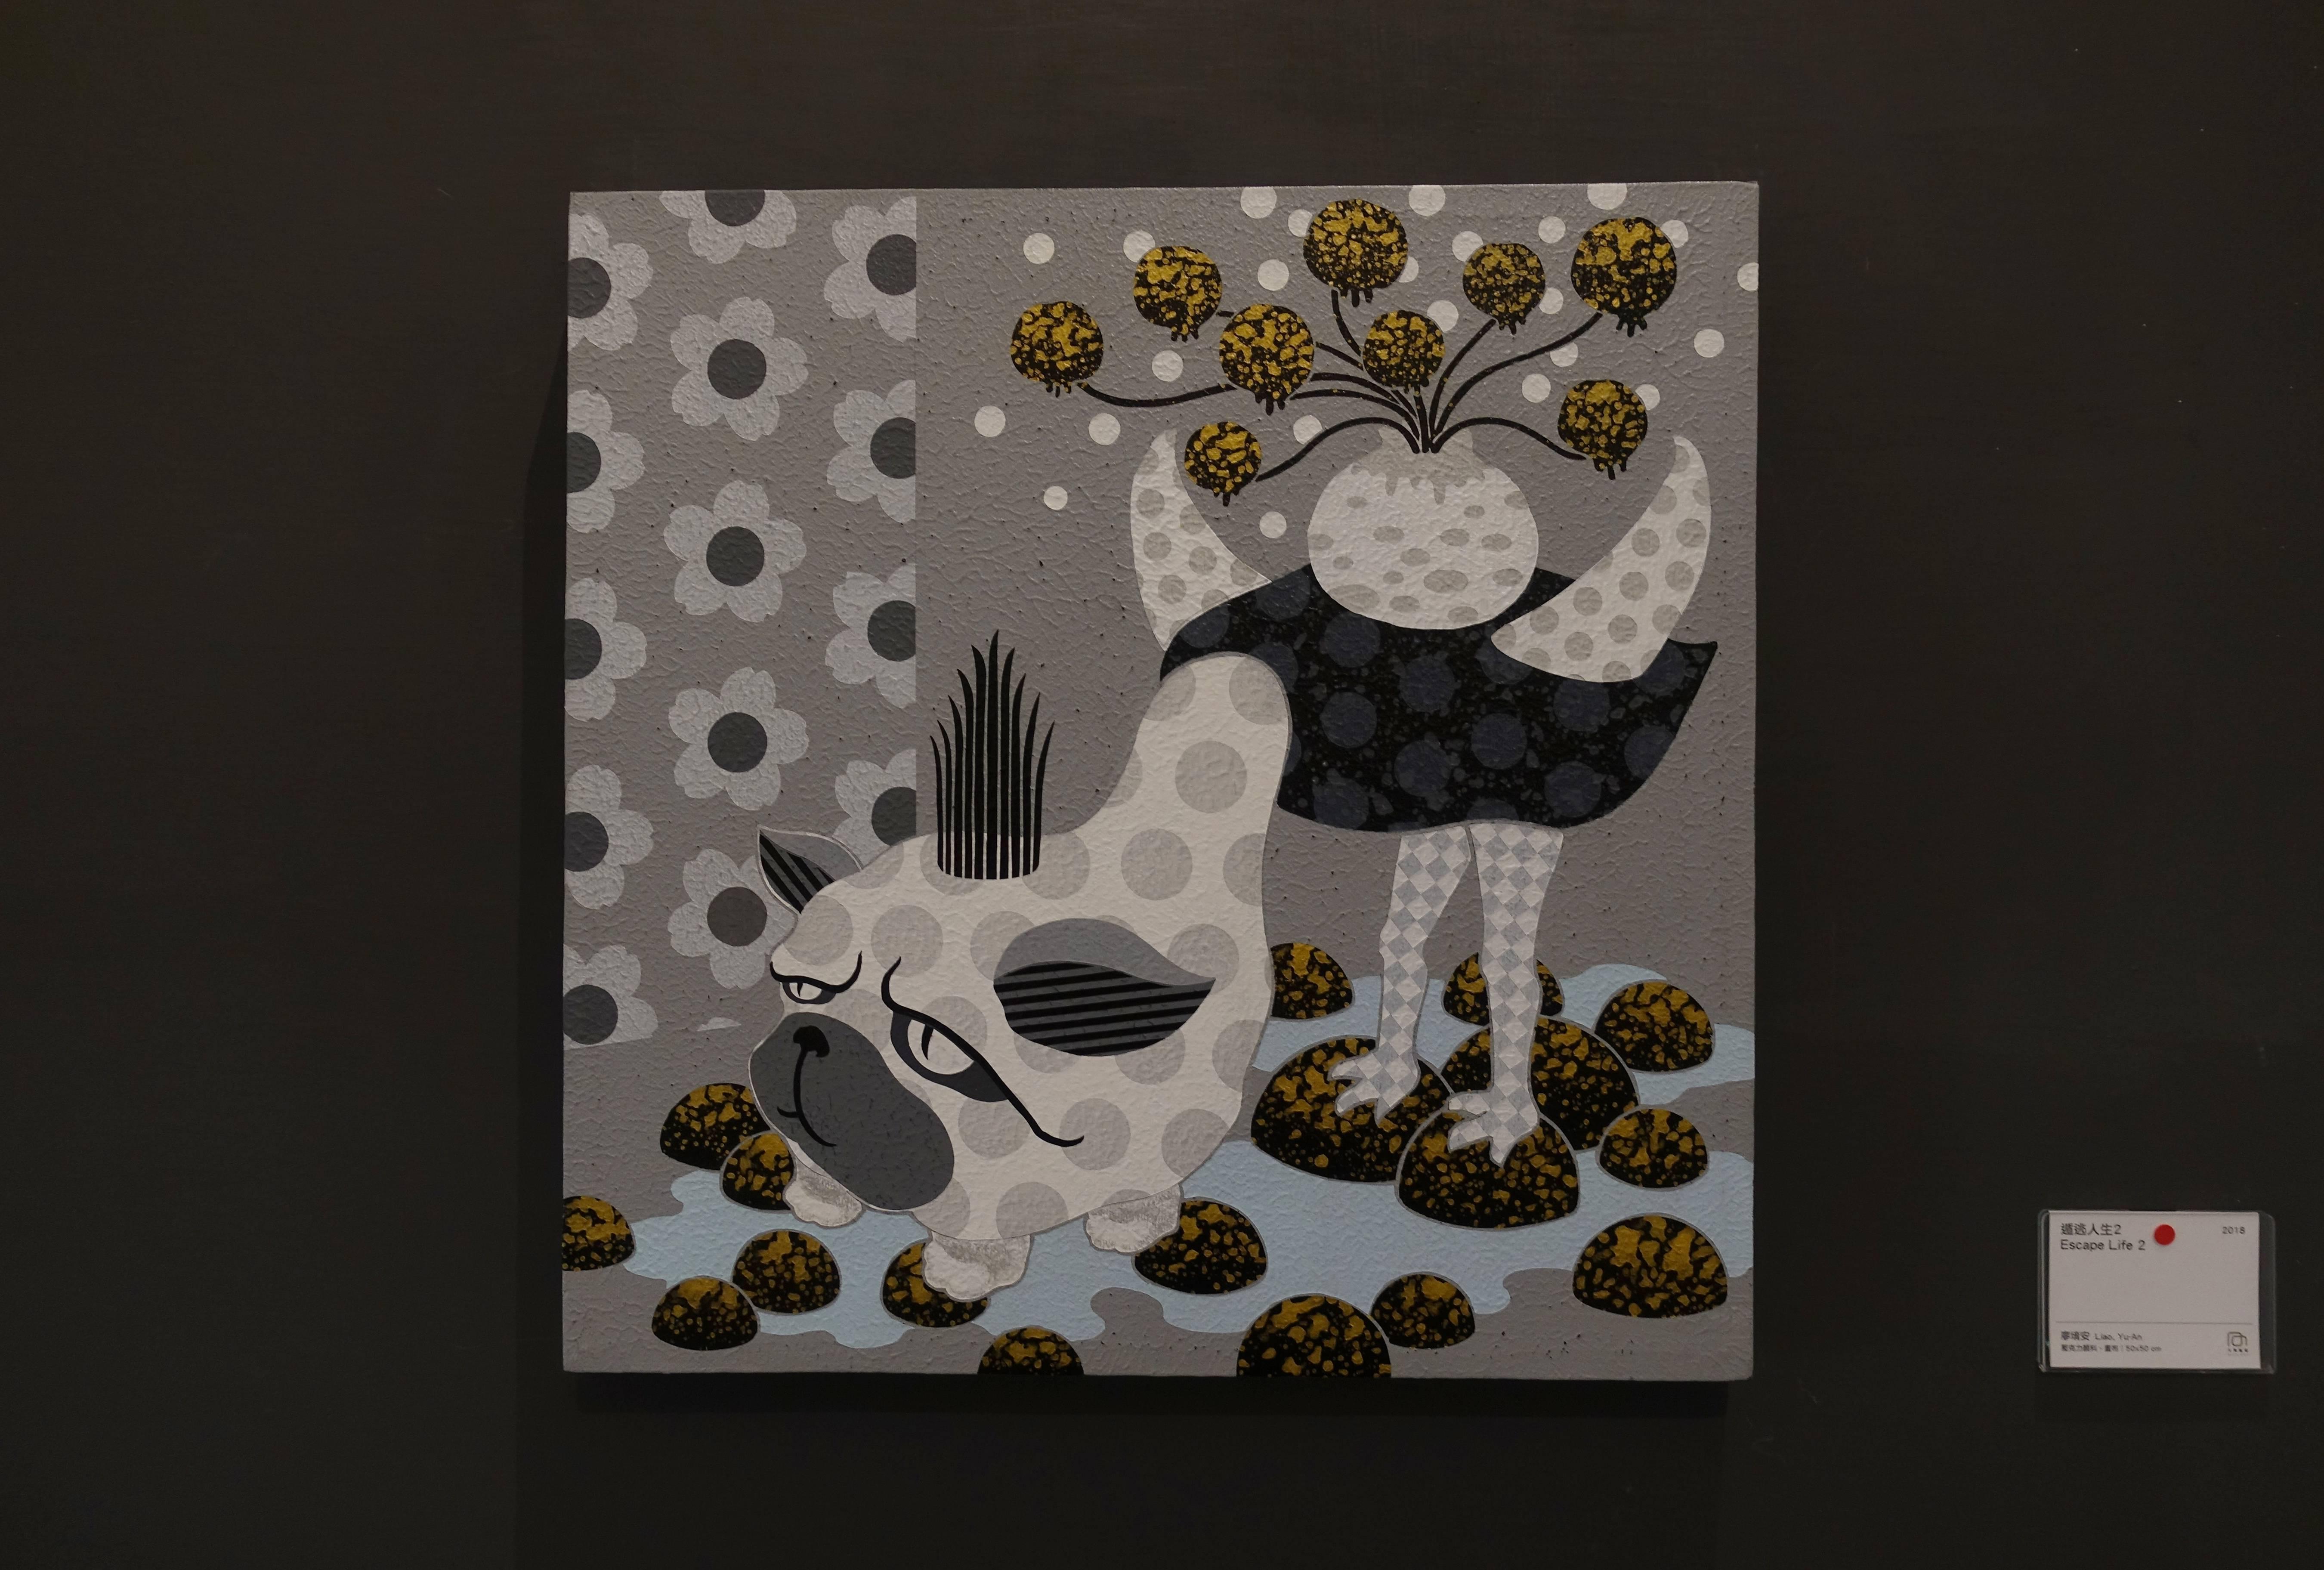 廖堉安,《遁逃人生2Escape Life 2》,壓克力、畫布,50x50 cm,2018。